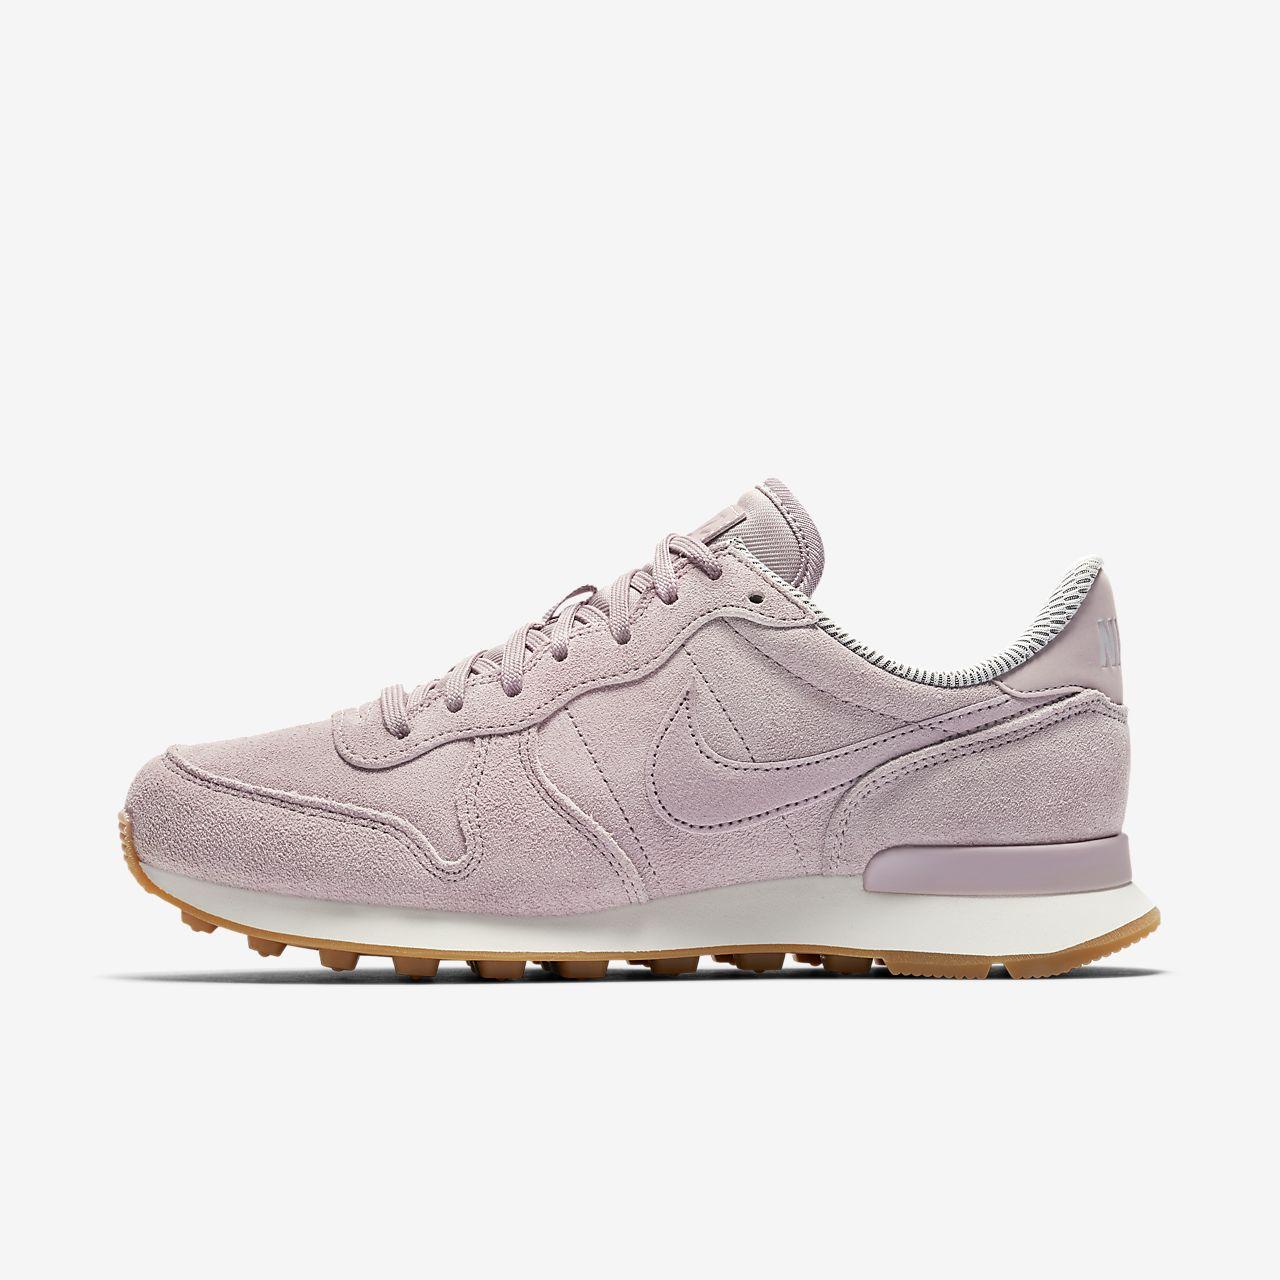 Chaussure MA Nike Internationalist SE pour MA Chaussure 590ae6